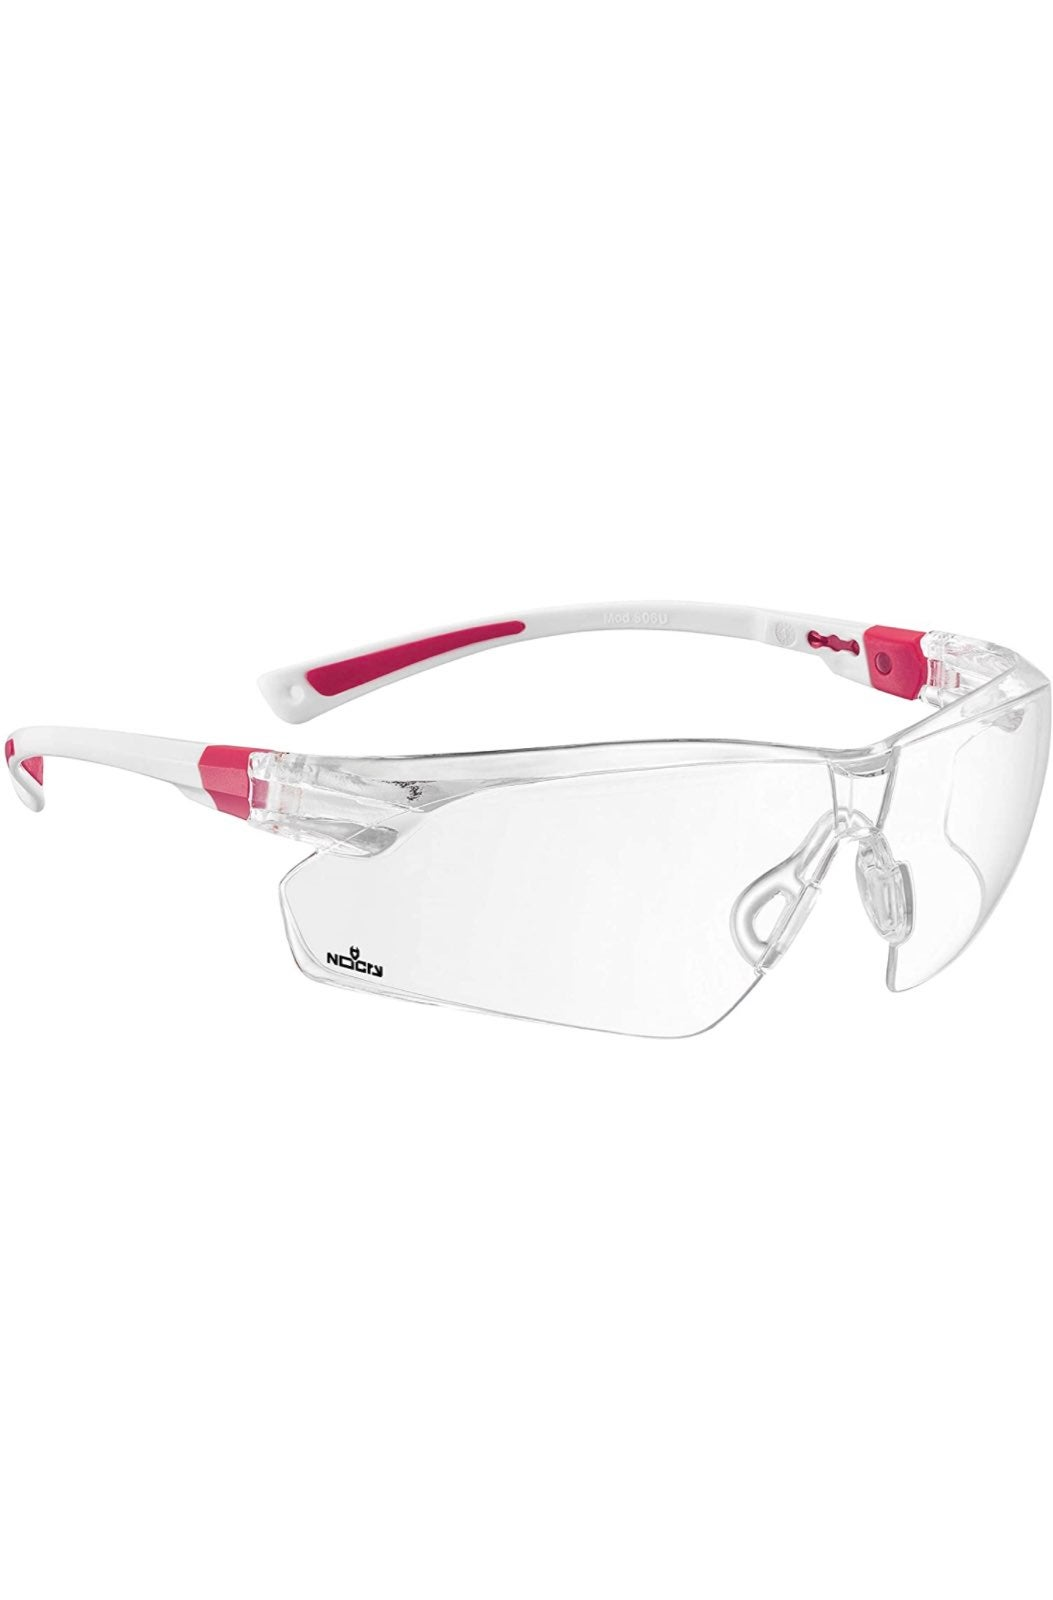 Lab glasses